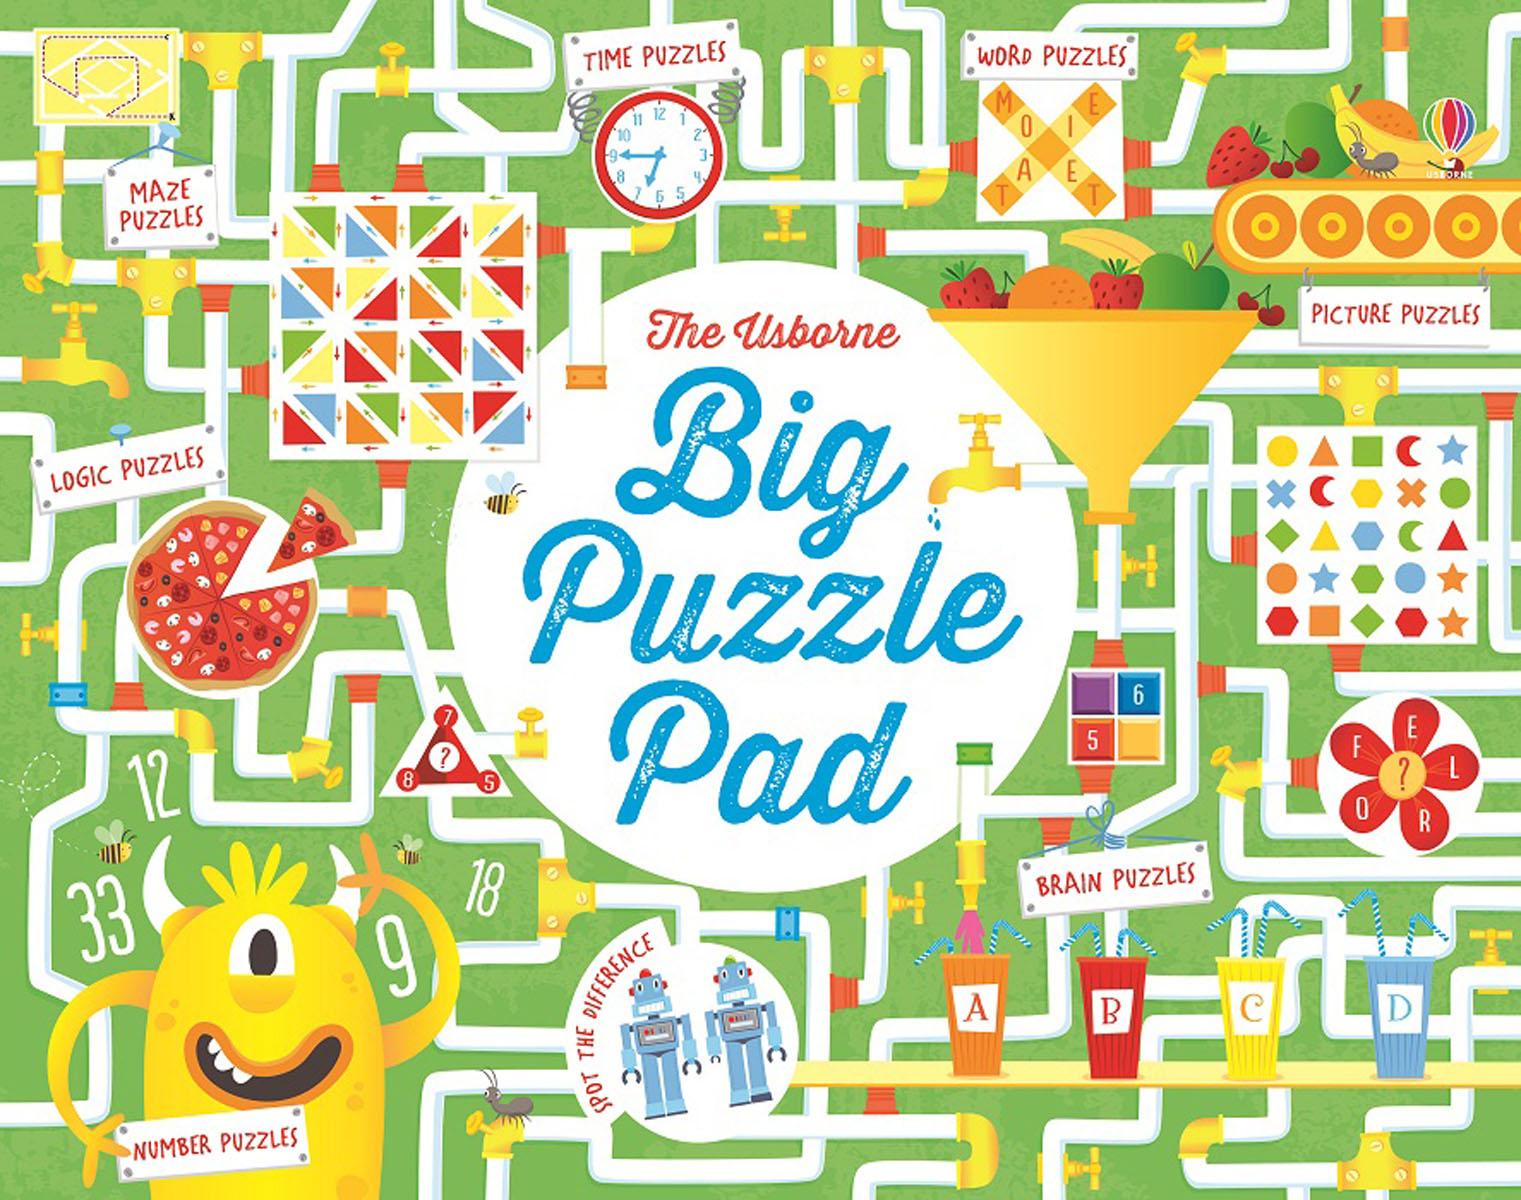 Big Puzzle Pad brain sharpening memory puzzles